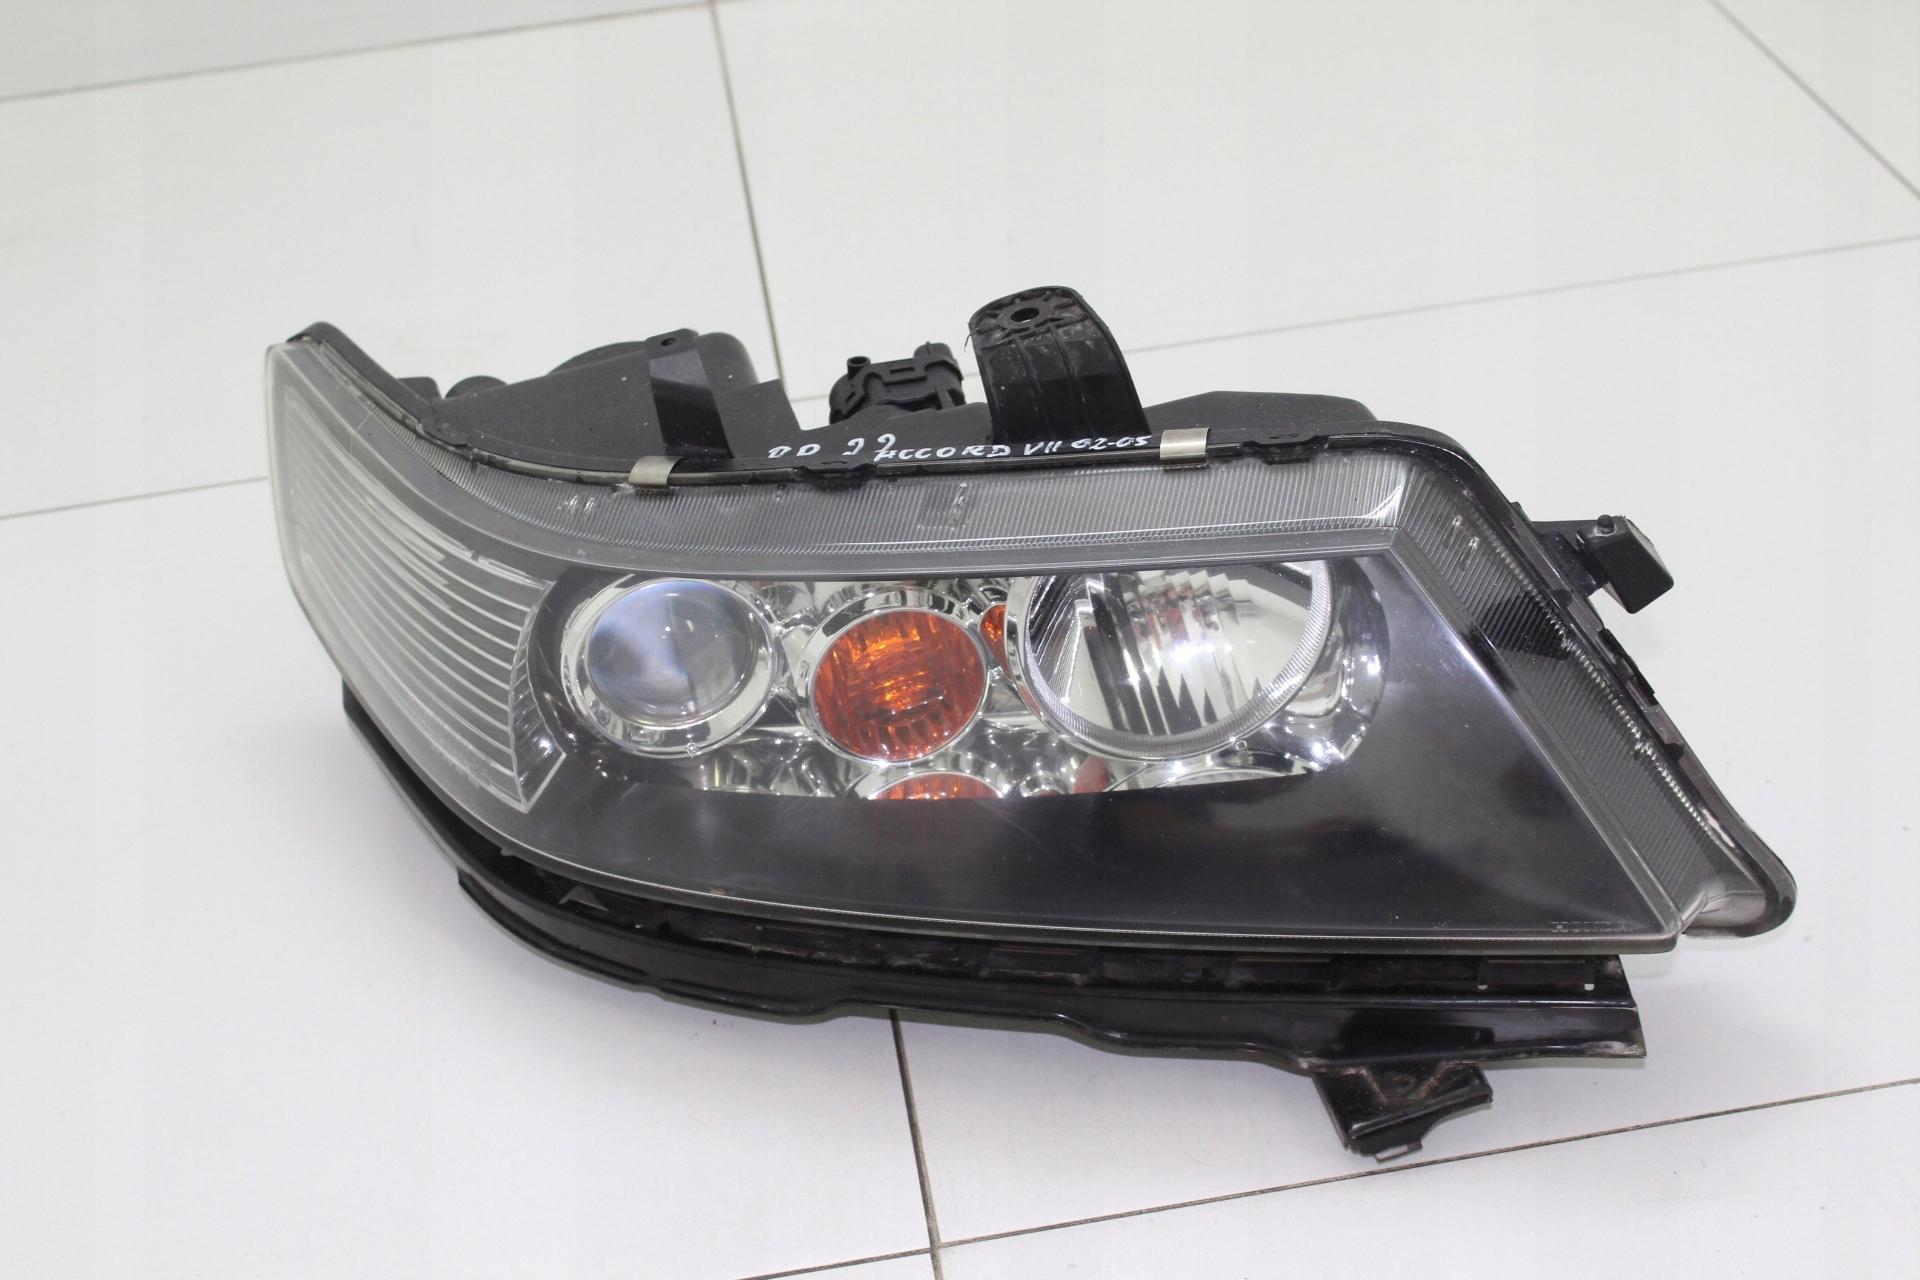 Lampa Prawy Przód Honda Accord Vii 7 02 05r 7539622571